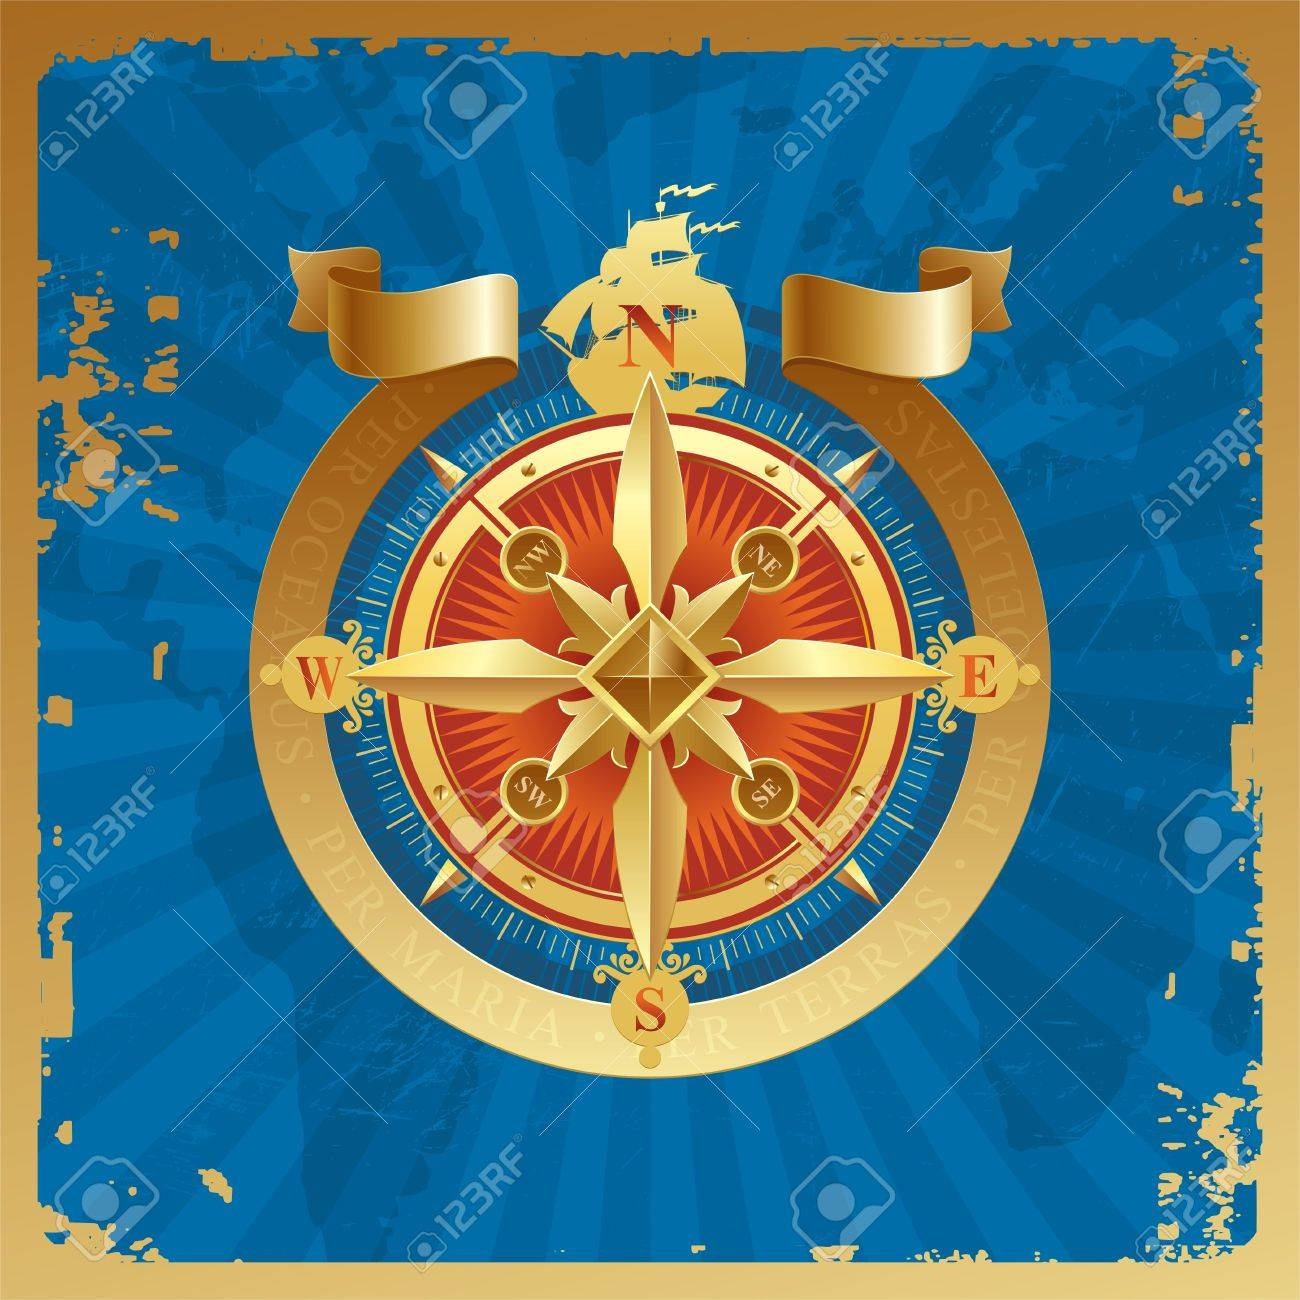 Golden compass rose on a grunge world map background royalty free golden compass rose on a grunge world map background stock vector 9903110 gumiabroncs Gallery